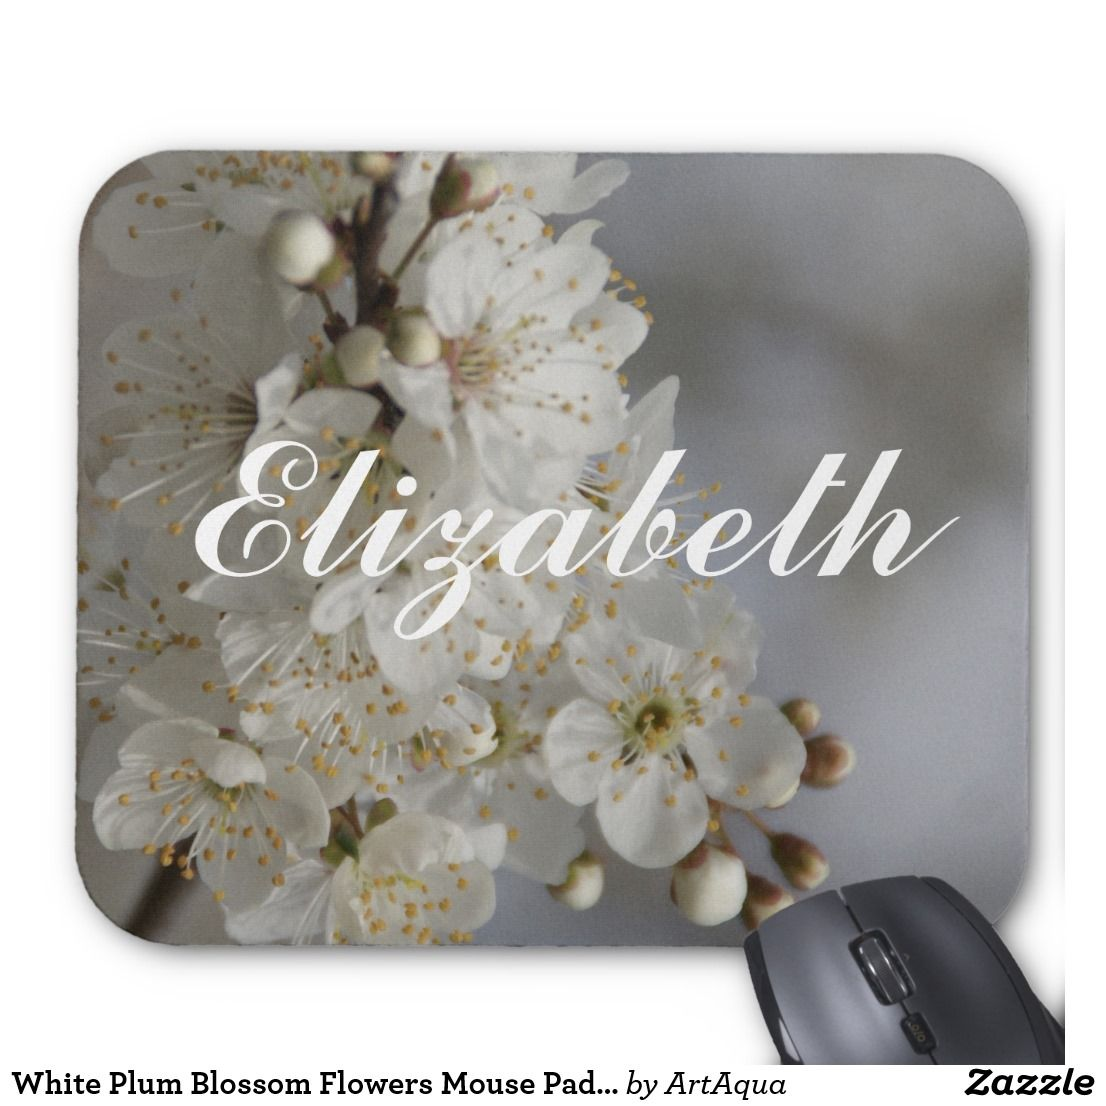 White Plum Blossom Flowers Mouse Pad Elizabeth White Plum